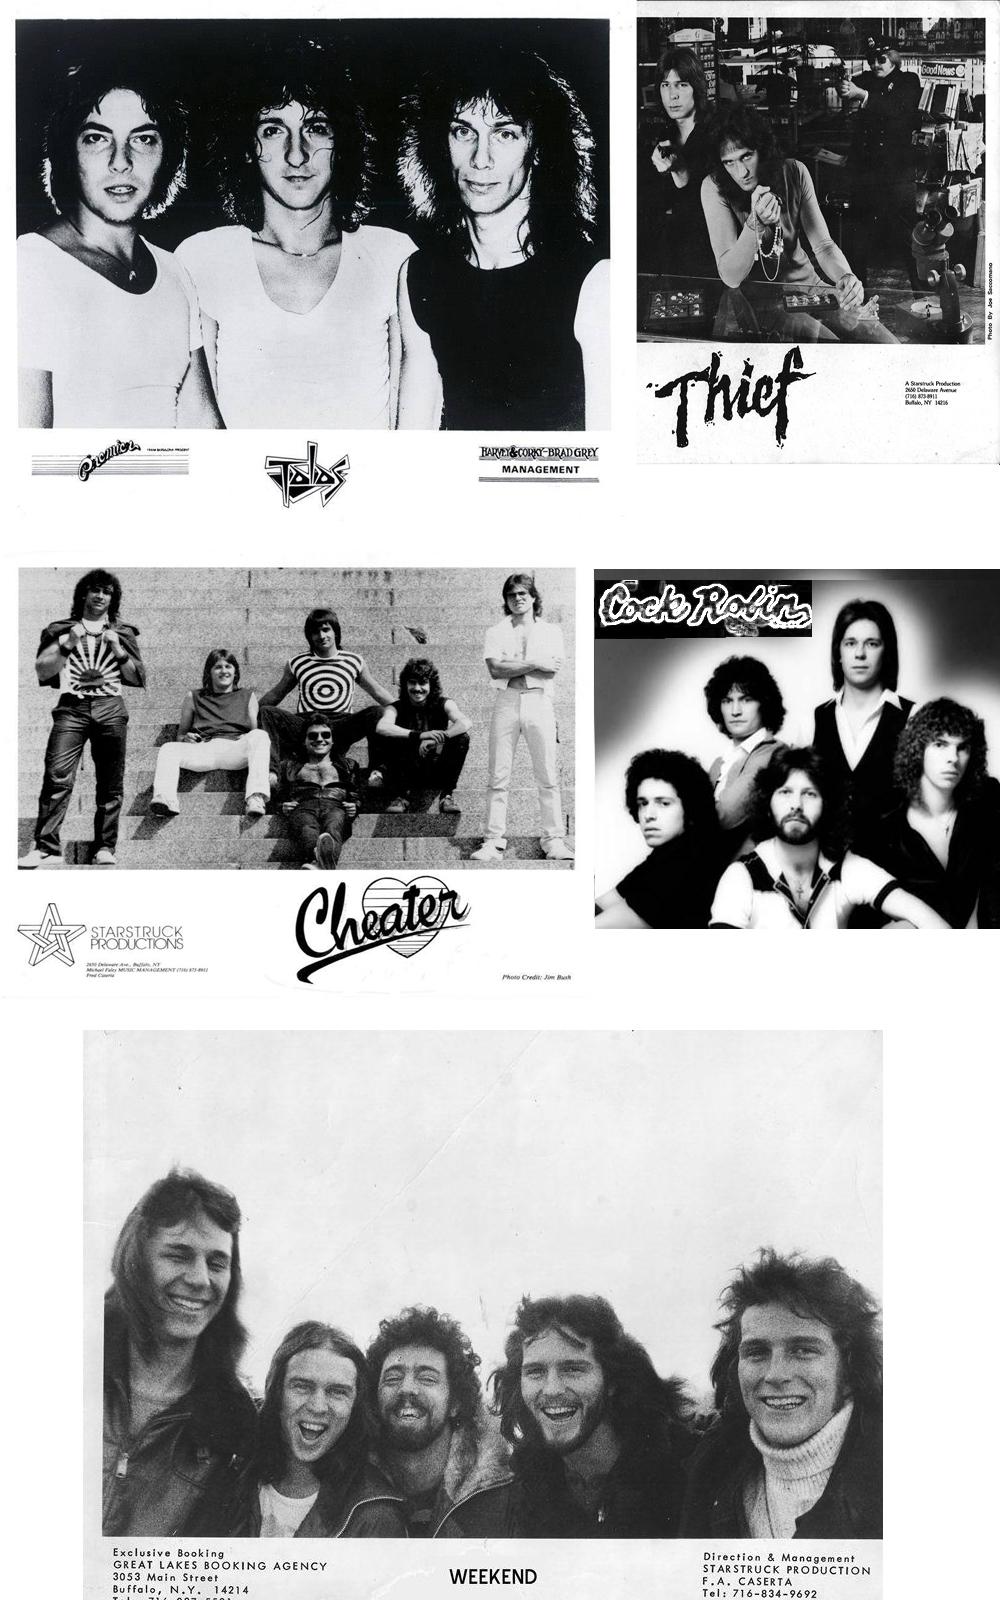 starstruck-bands